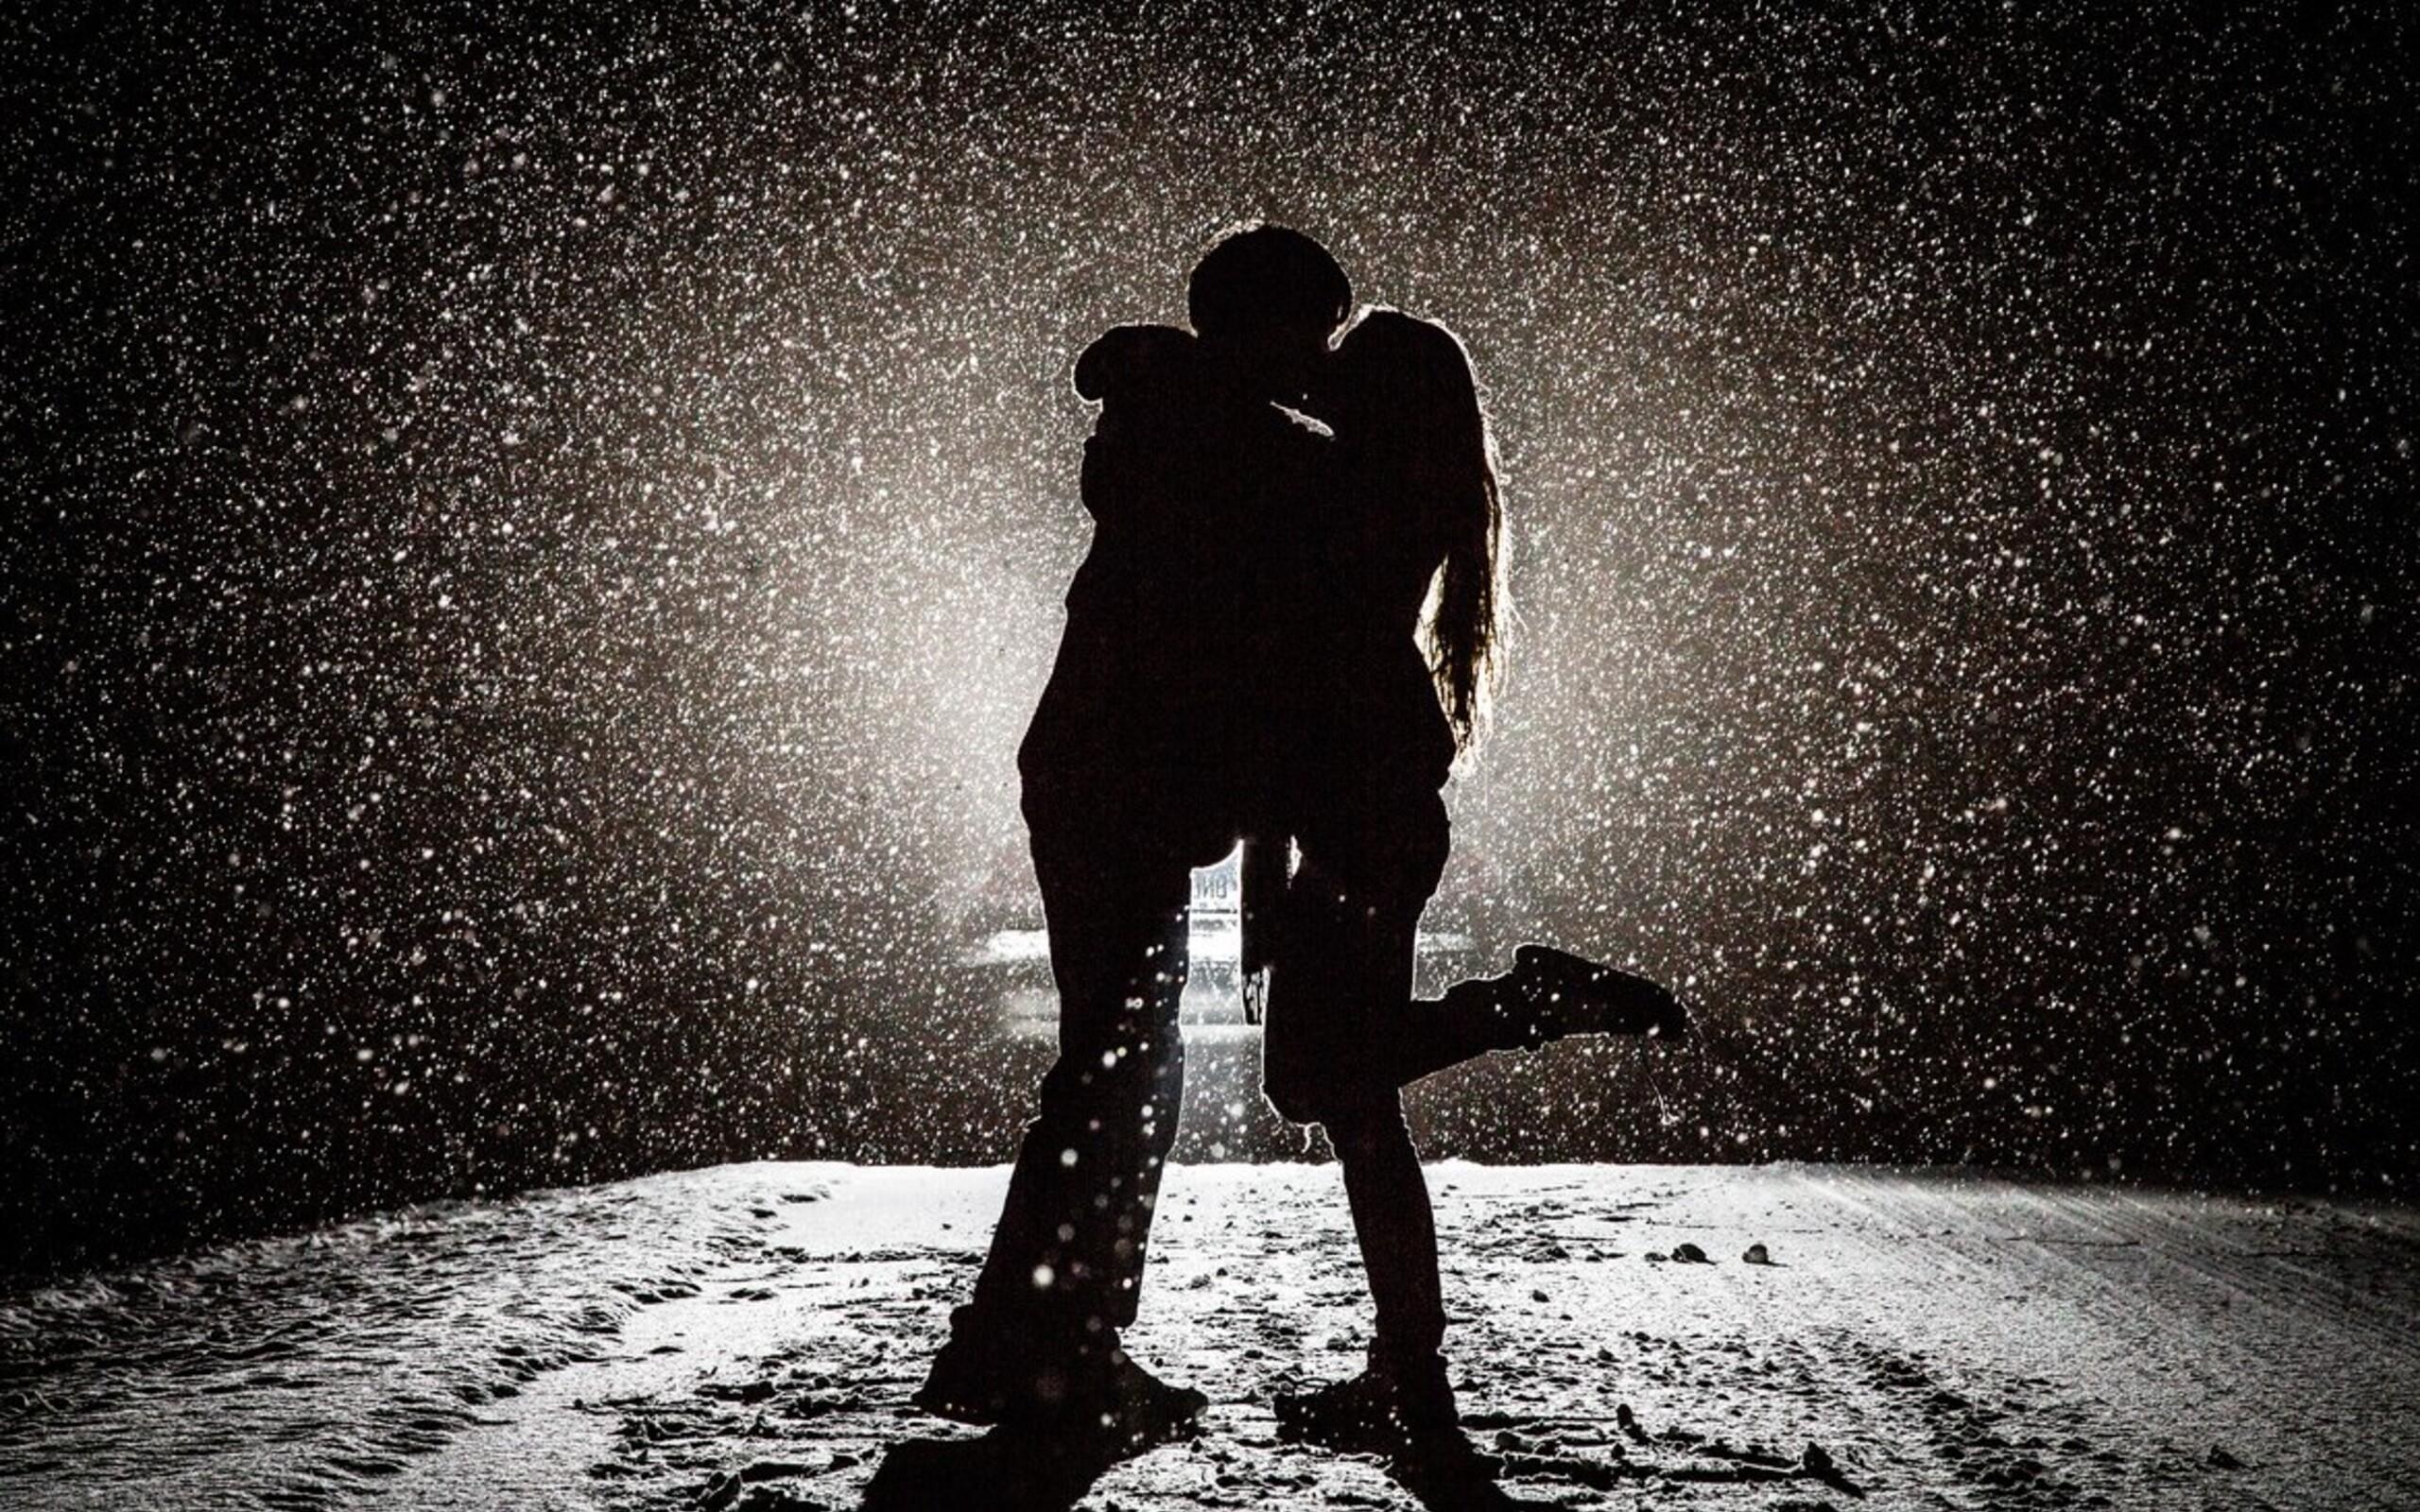 couple-kissing-in-snow.jpg